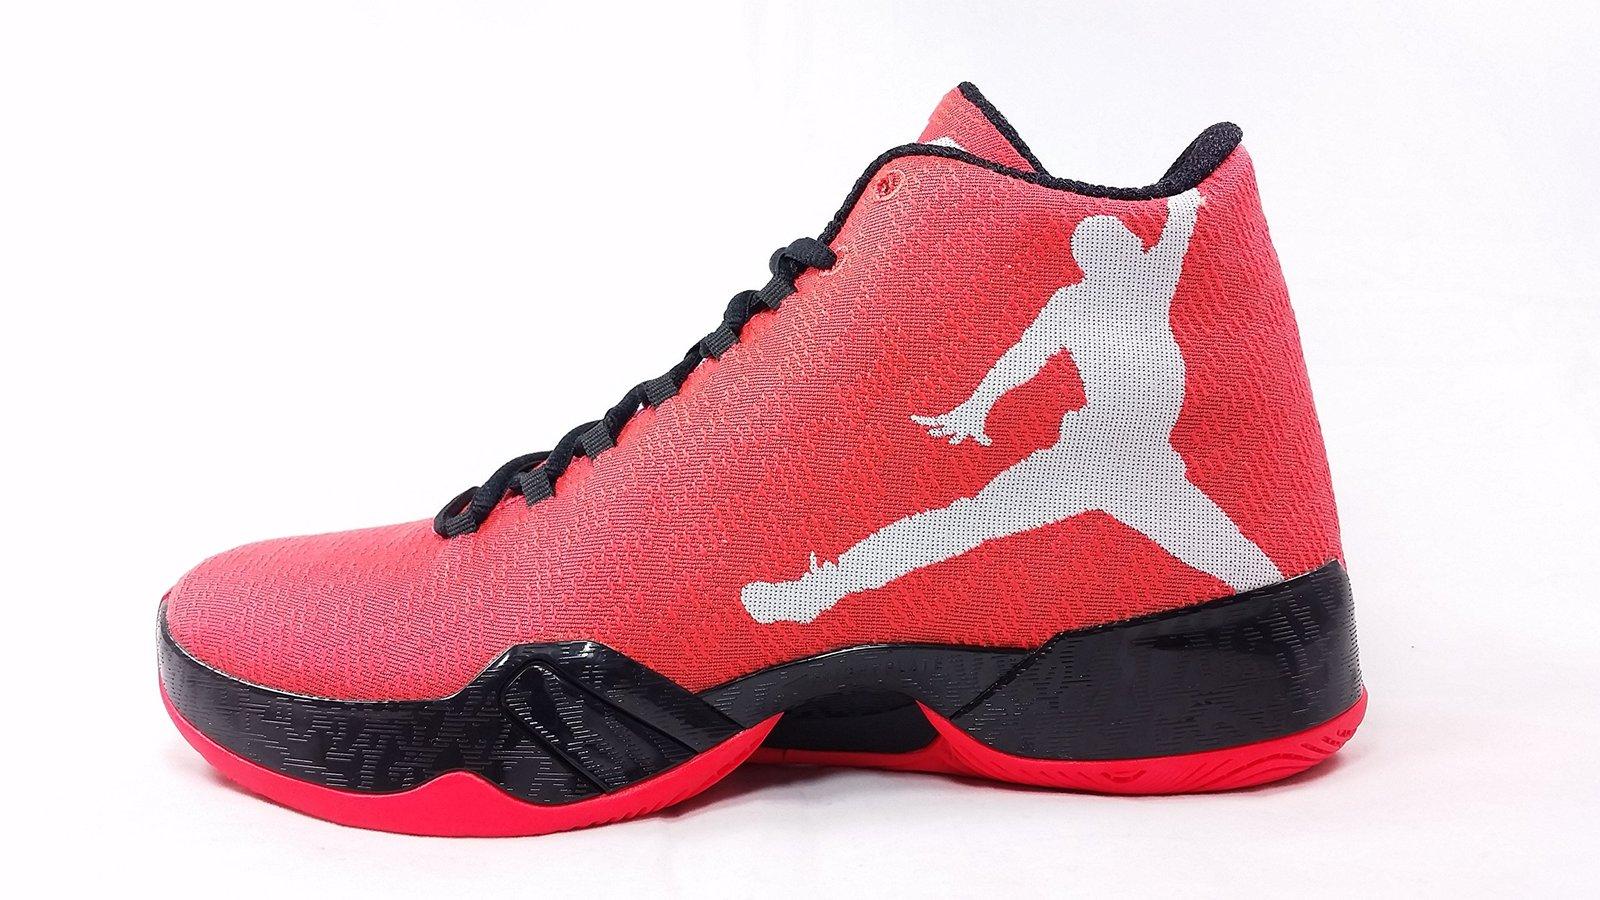 203cc063341f14 Nike Men s Air Jordan Infrared 23 Basketball Shoes (695515-623) Men s 7.5 D